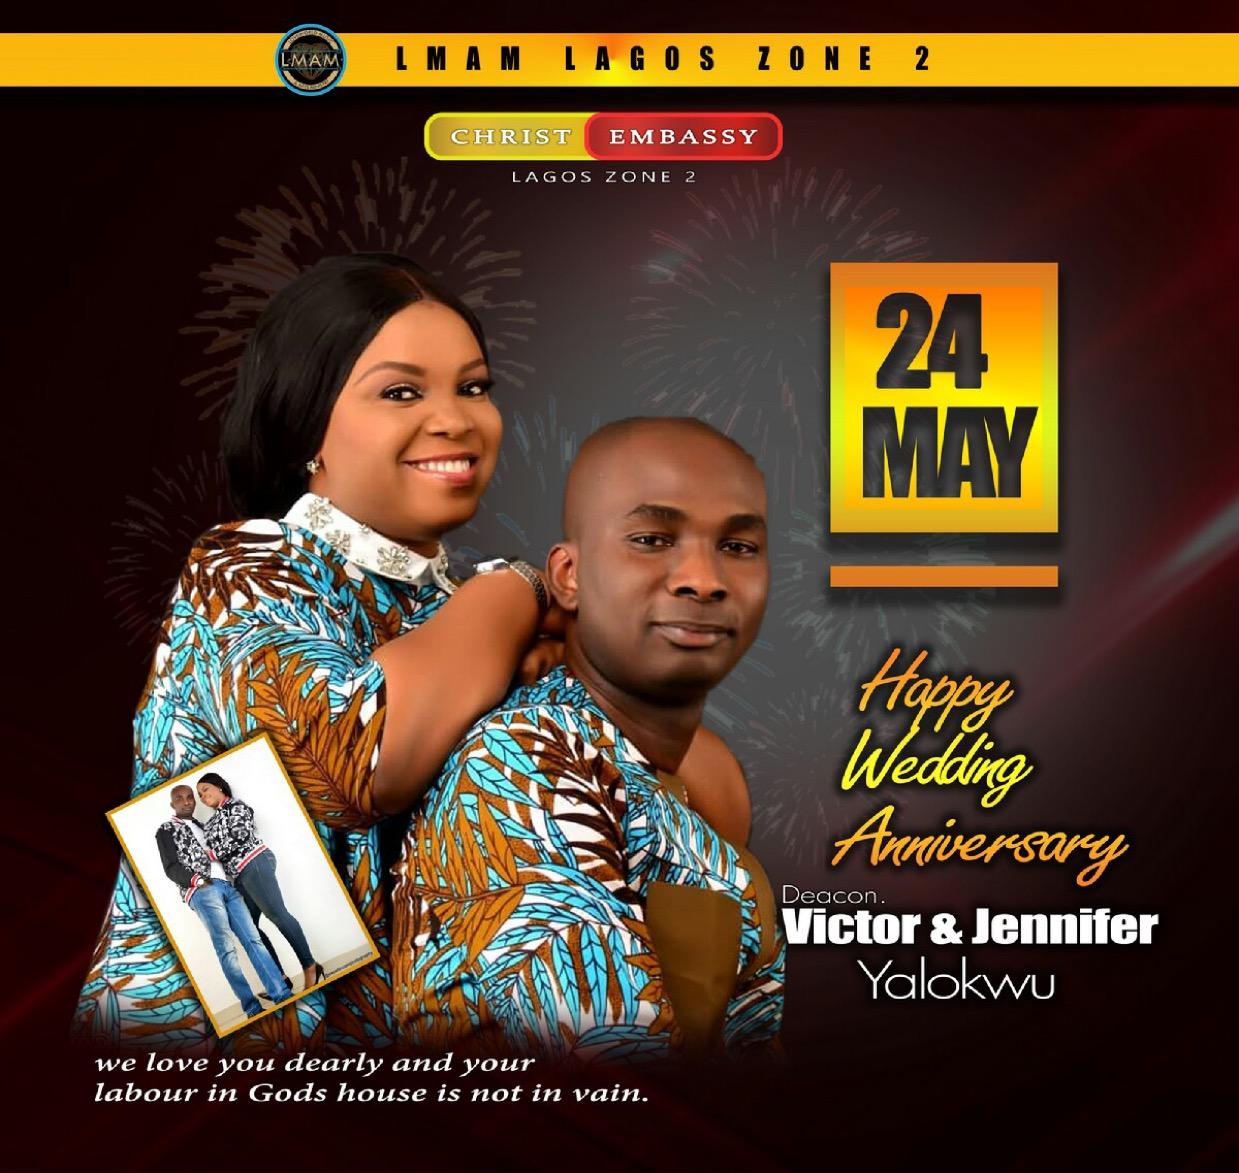 Happy Anniversary Dcn Victor &